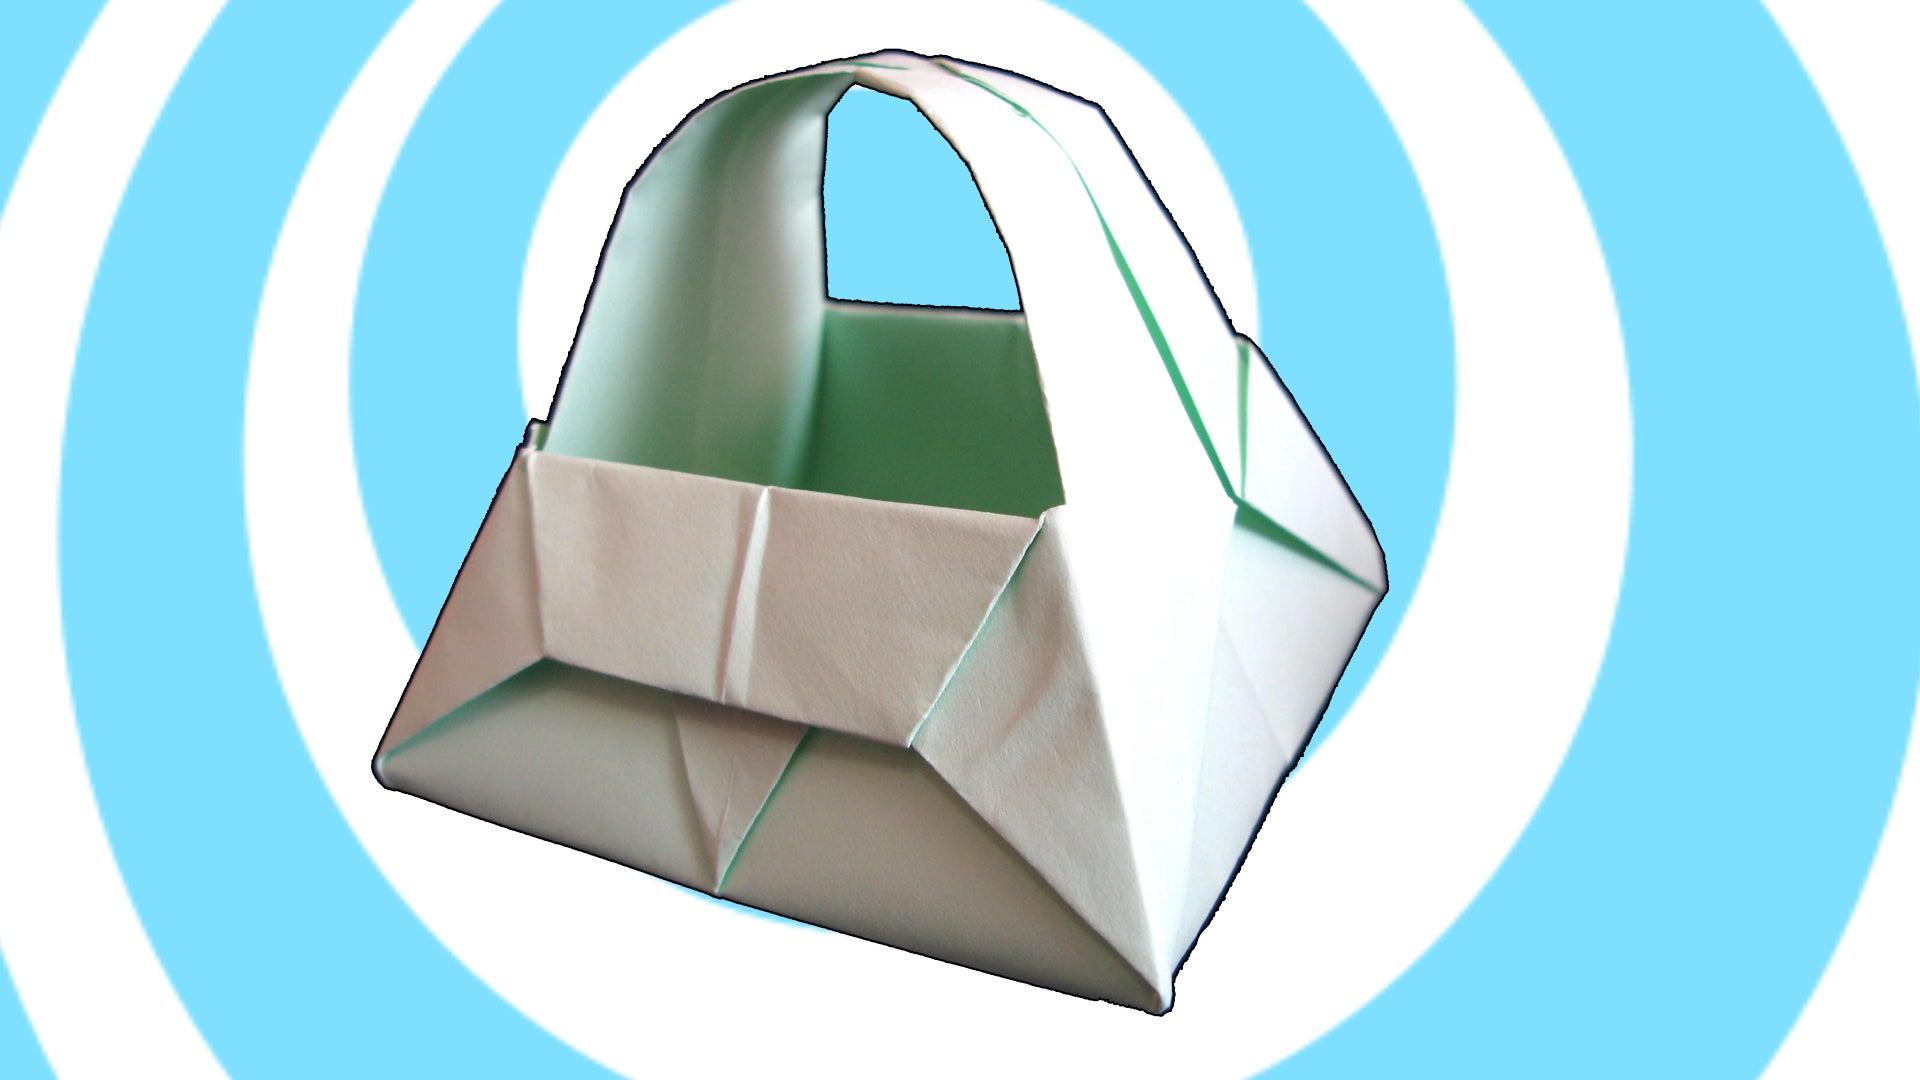 3D Origami Paper Basket/ Origami Bucket/ Advanced Origami/ Paper ... | 1080x1920